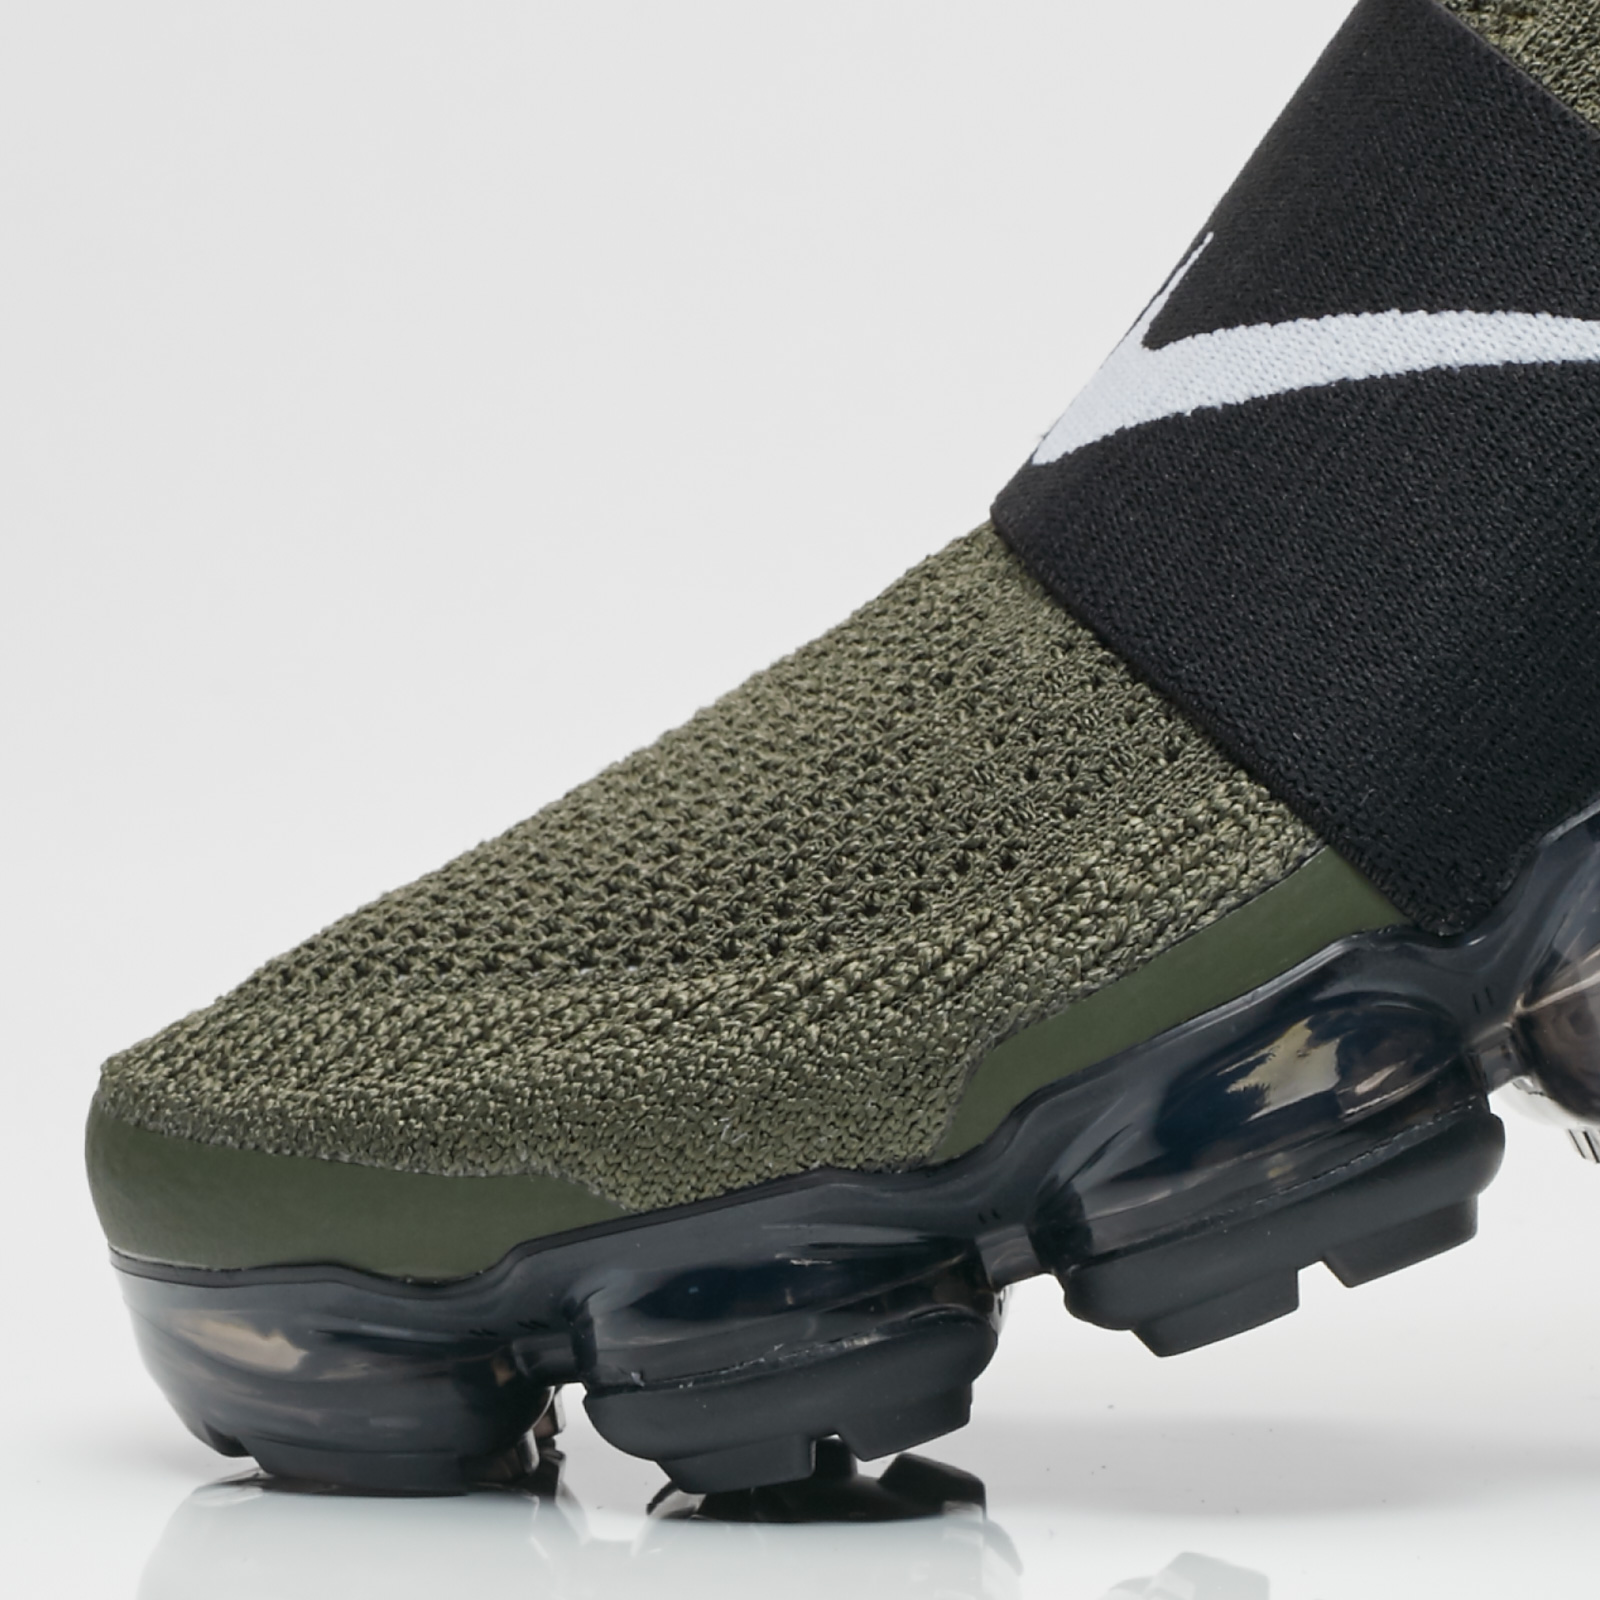 0fb3bd88321c5 Nike Air Vapormax Flyknit Moc - Aa4155-300 - Sneakersnstuff ...